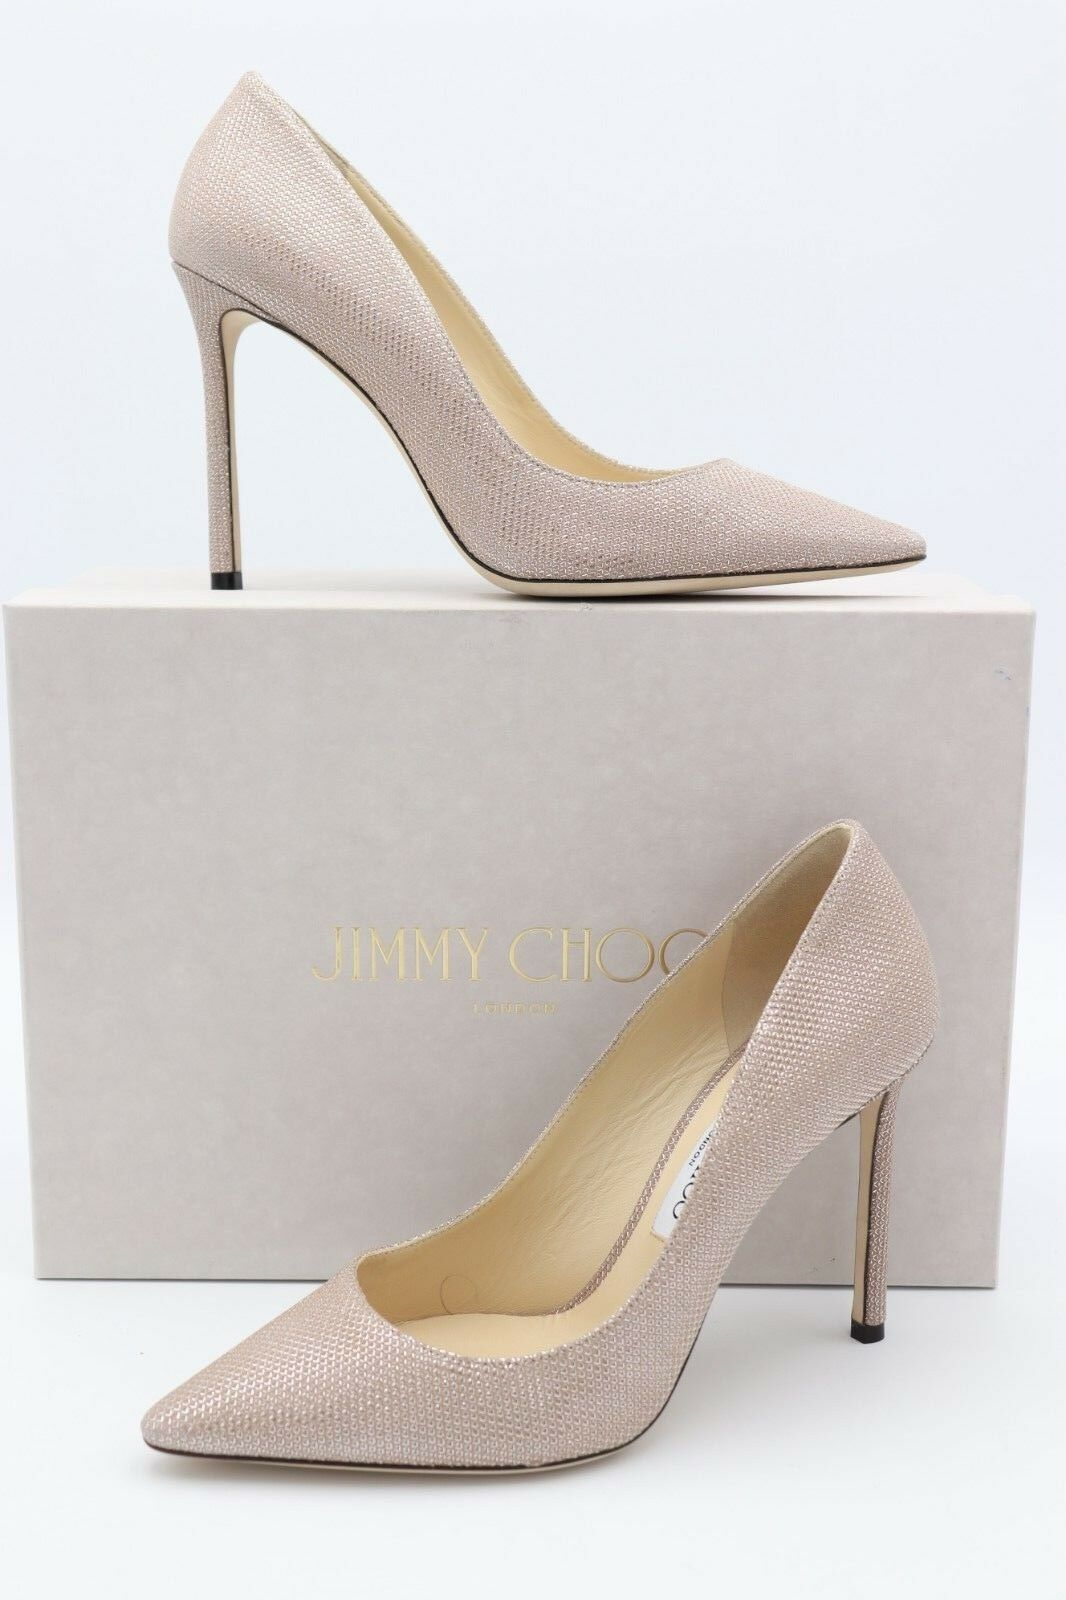 NIB Jimmy Choo Romy 100 Ballet Rosa Glitter Pointy  Toe Pump Heels 8.5 38.5  Pointy 675 f5ecd1